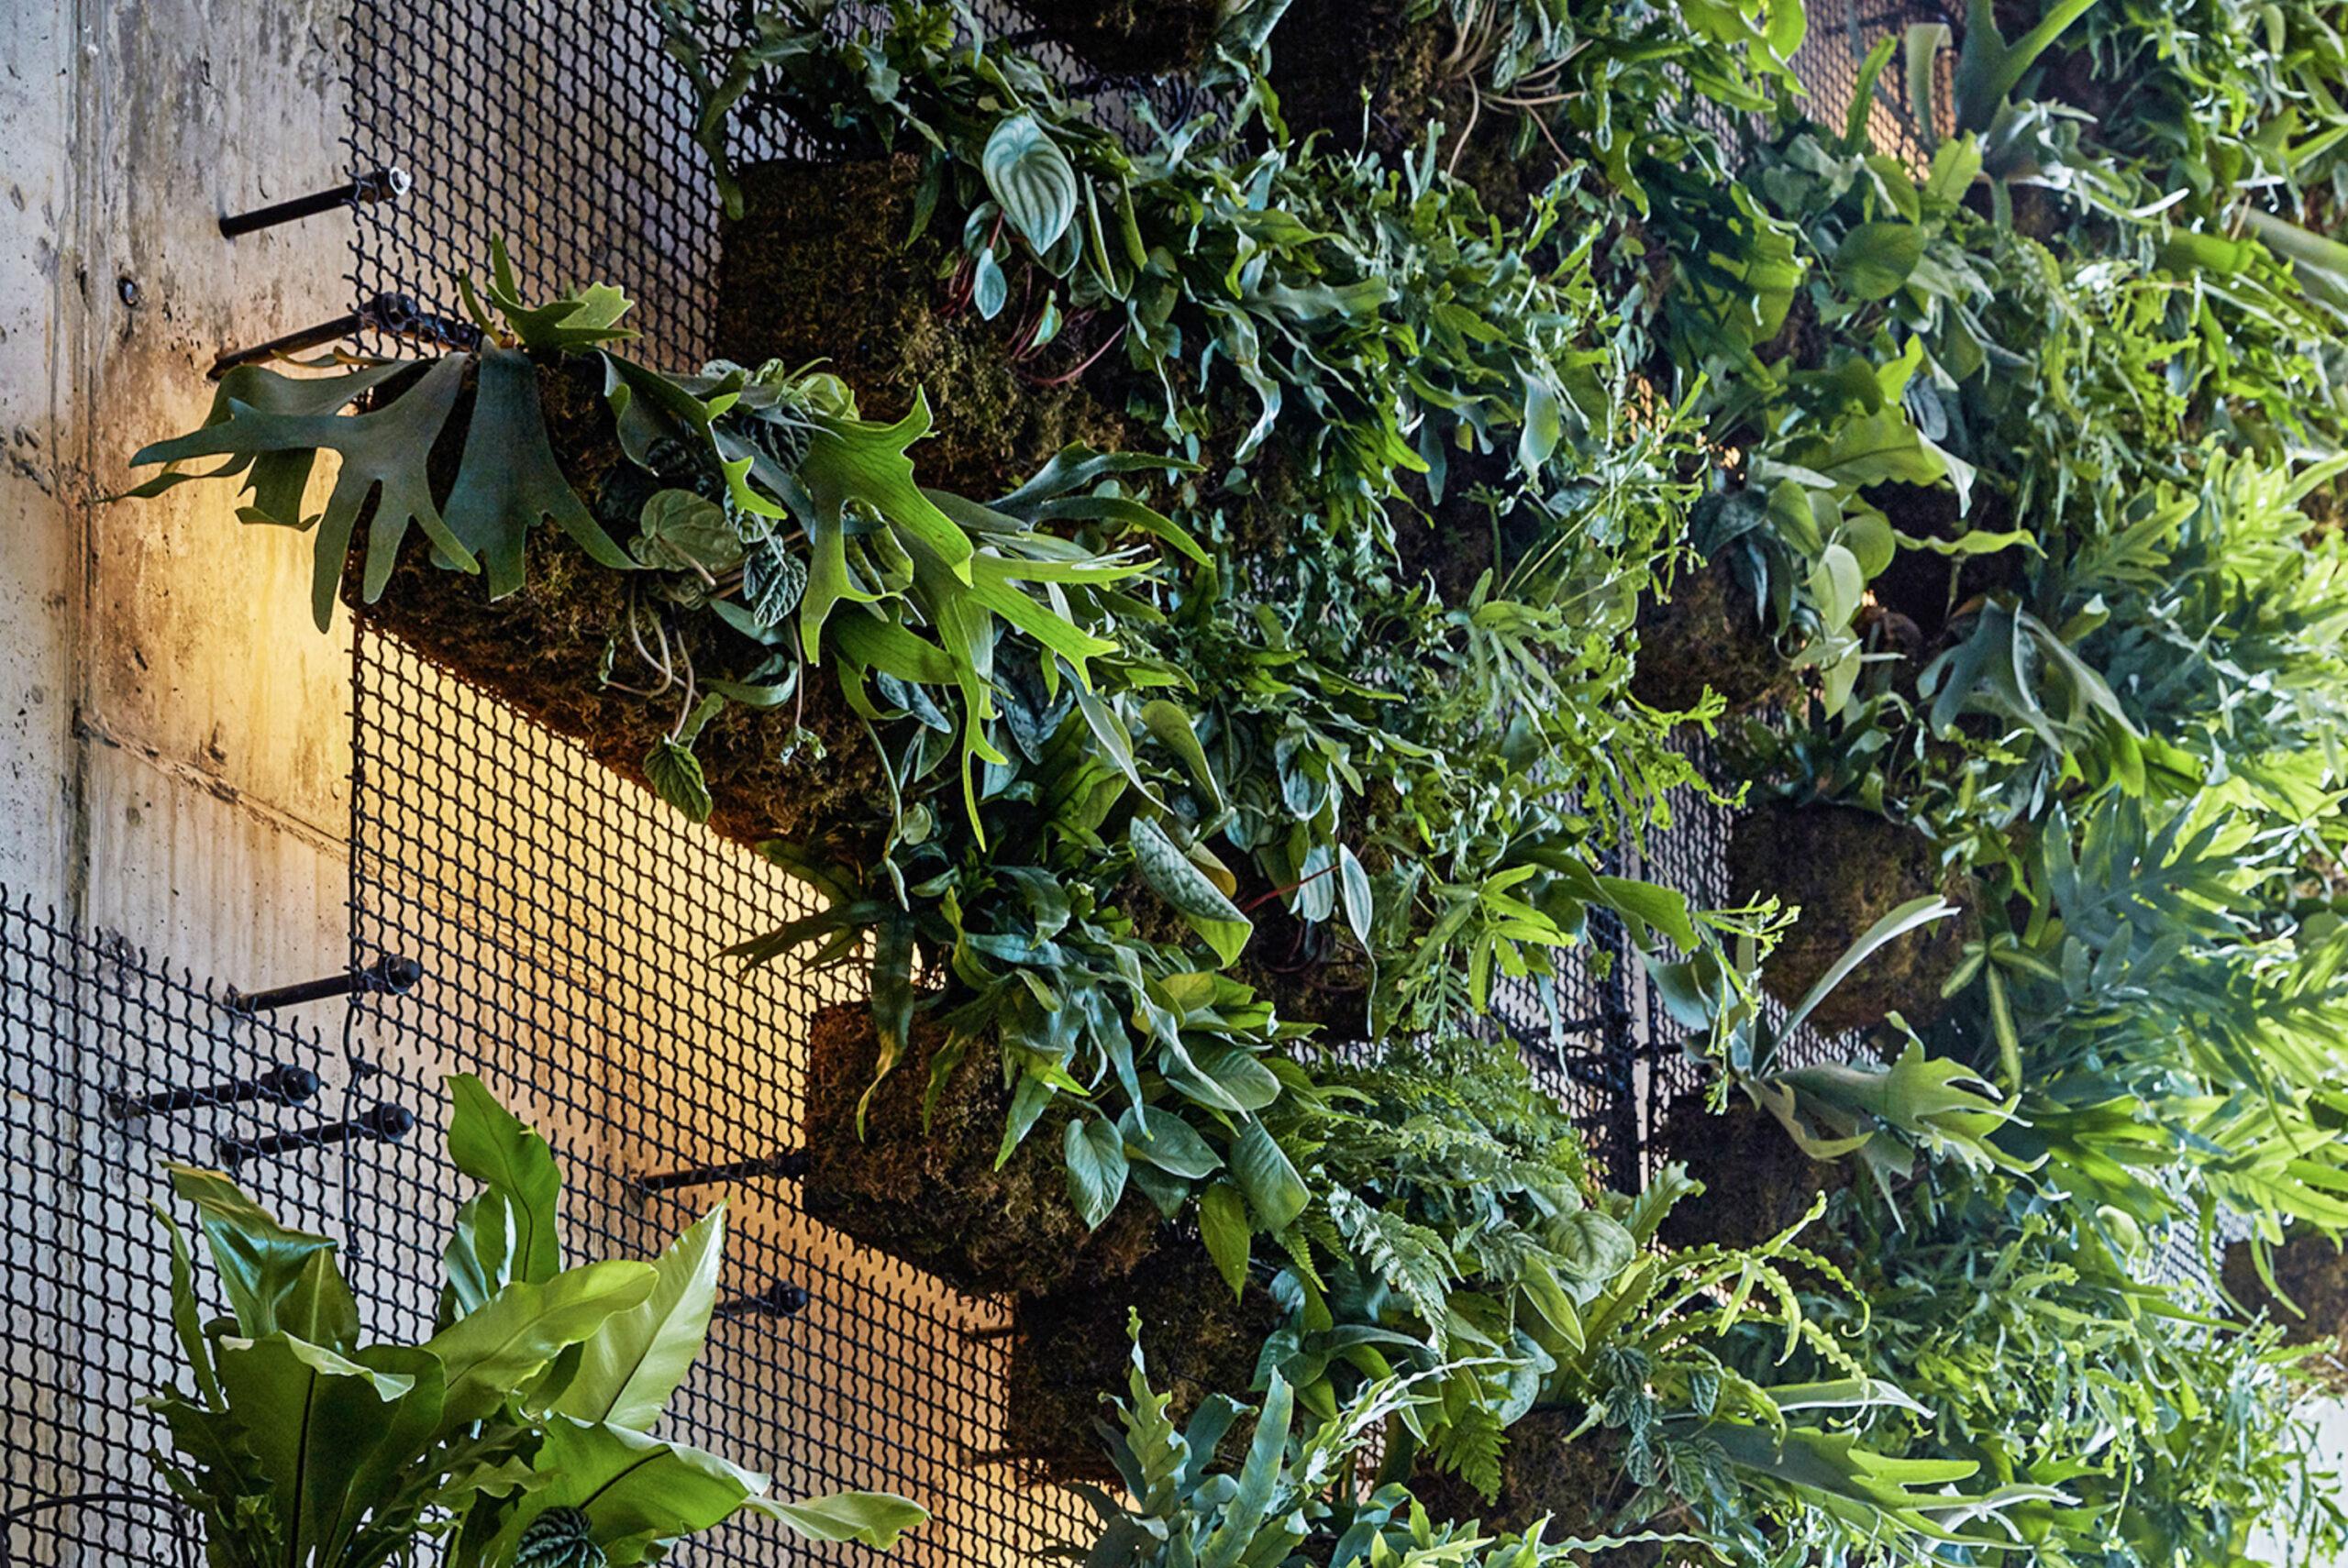 AgroSci Green Wall at 1 Hotel, Brooklyn, NYC